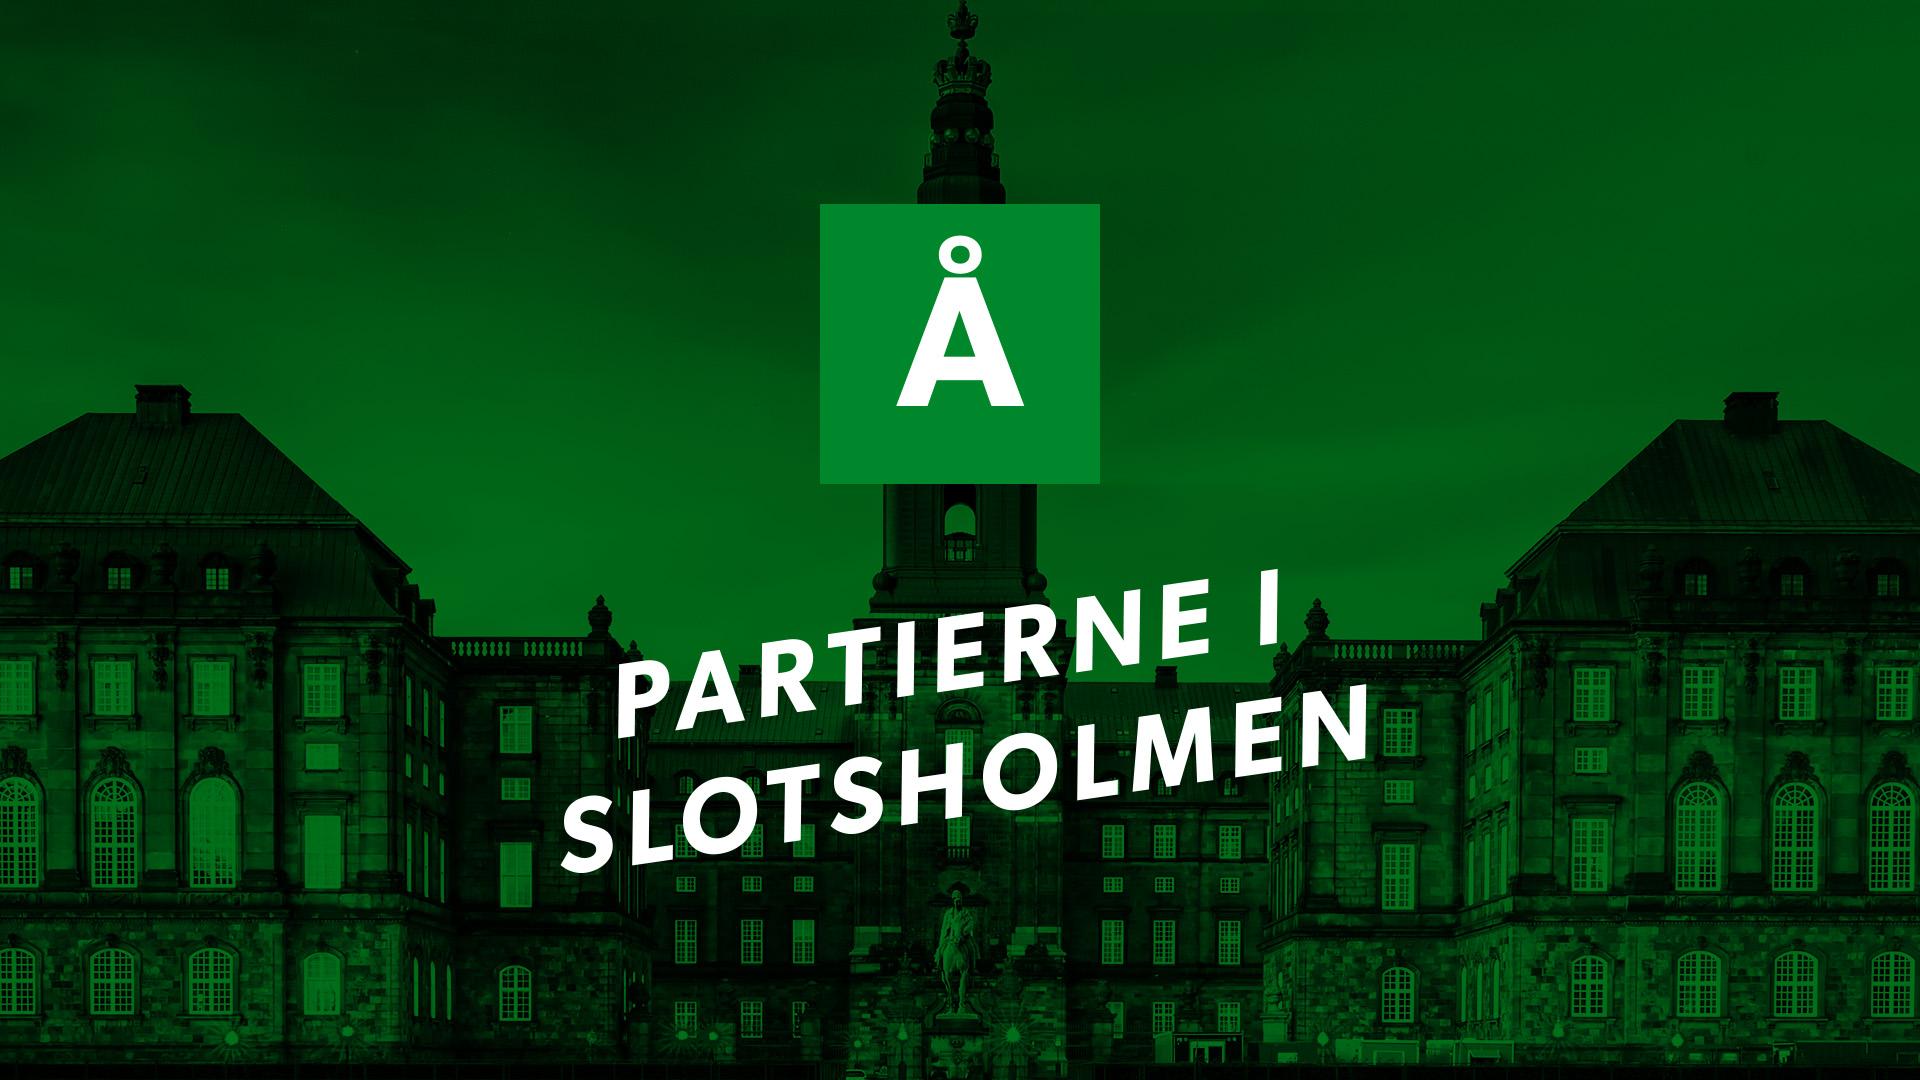 Partierne i Slotsholmen: Alternativet